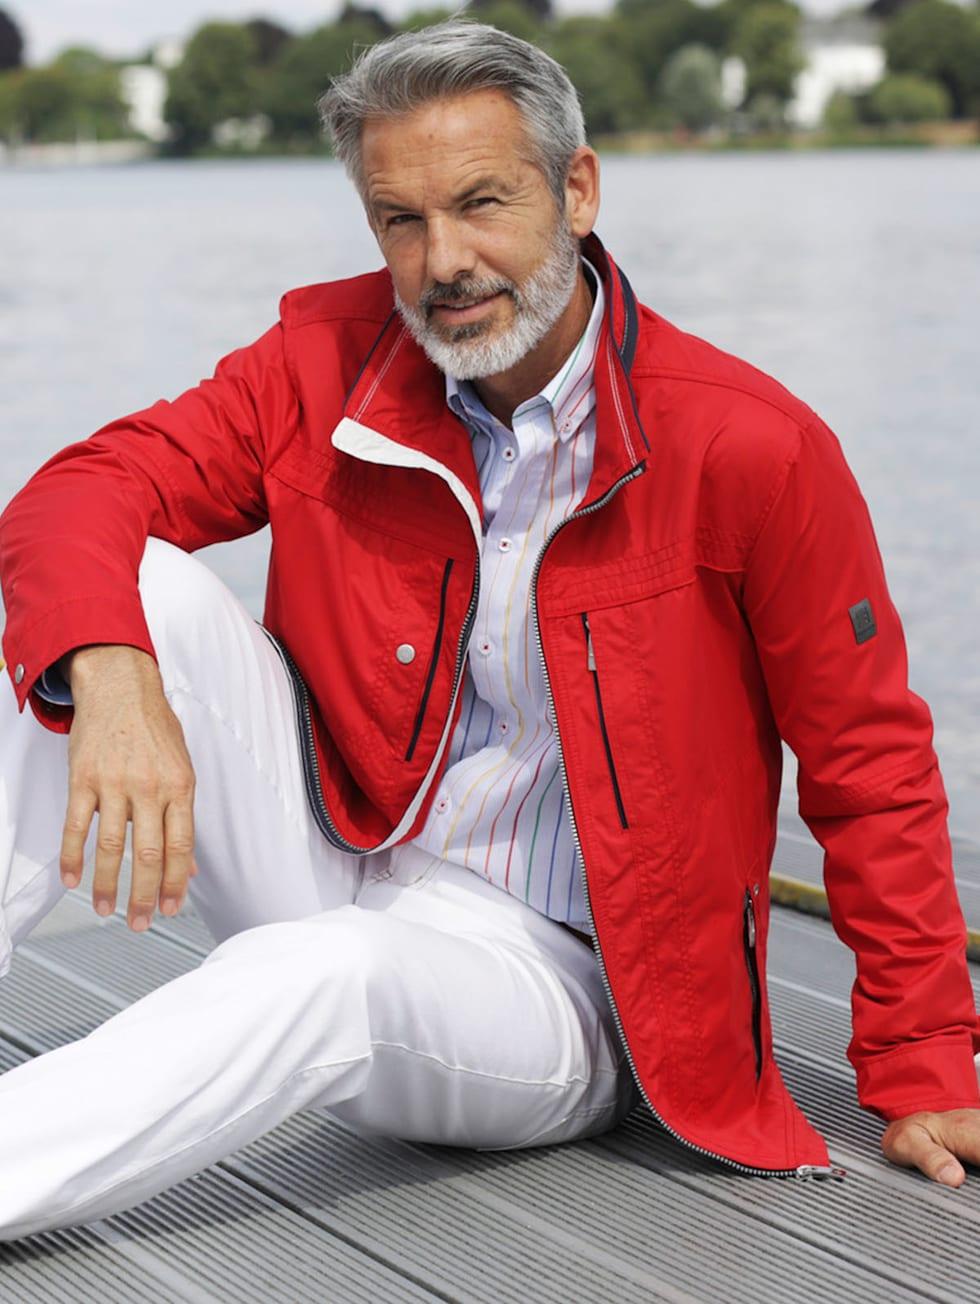 Comfort-Outfit: rote Jacke, blaues Hemd und weiße Hose